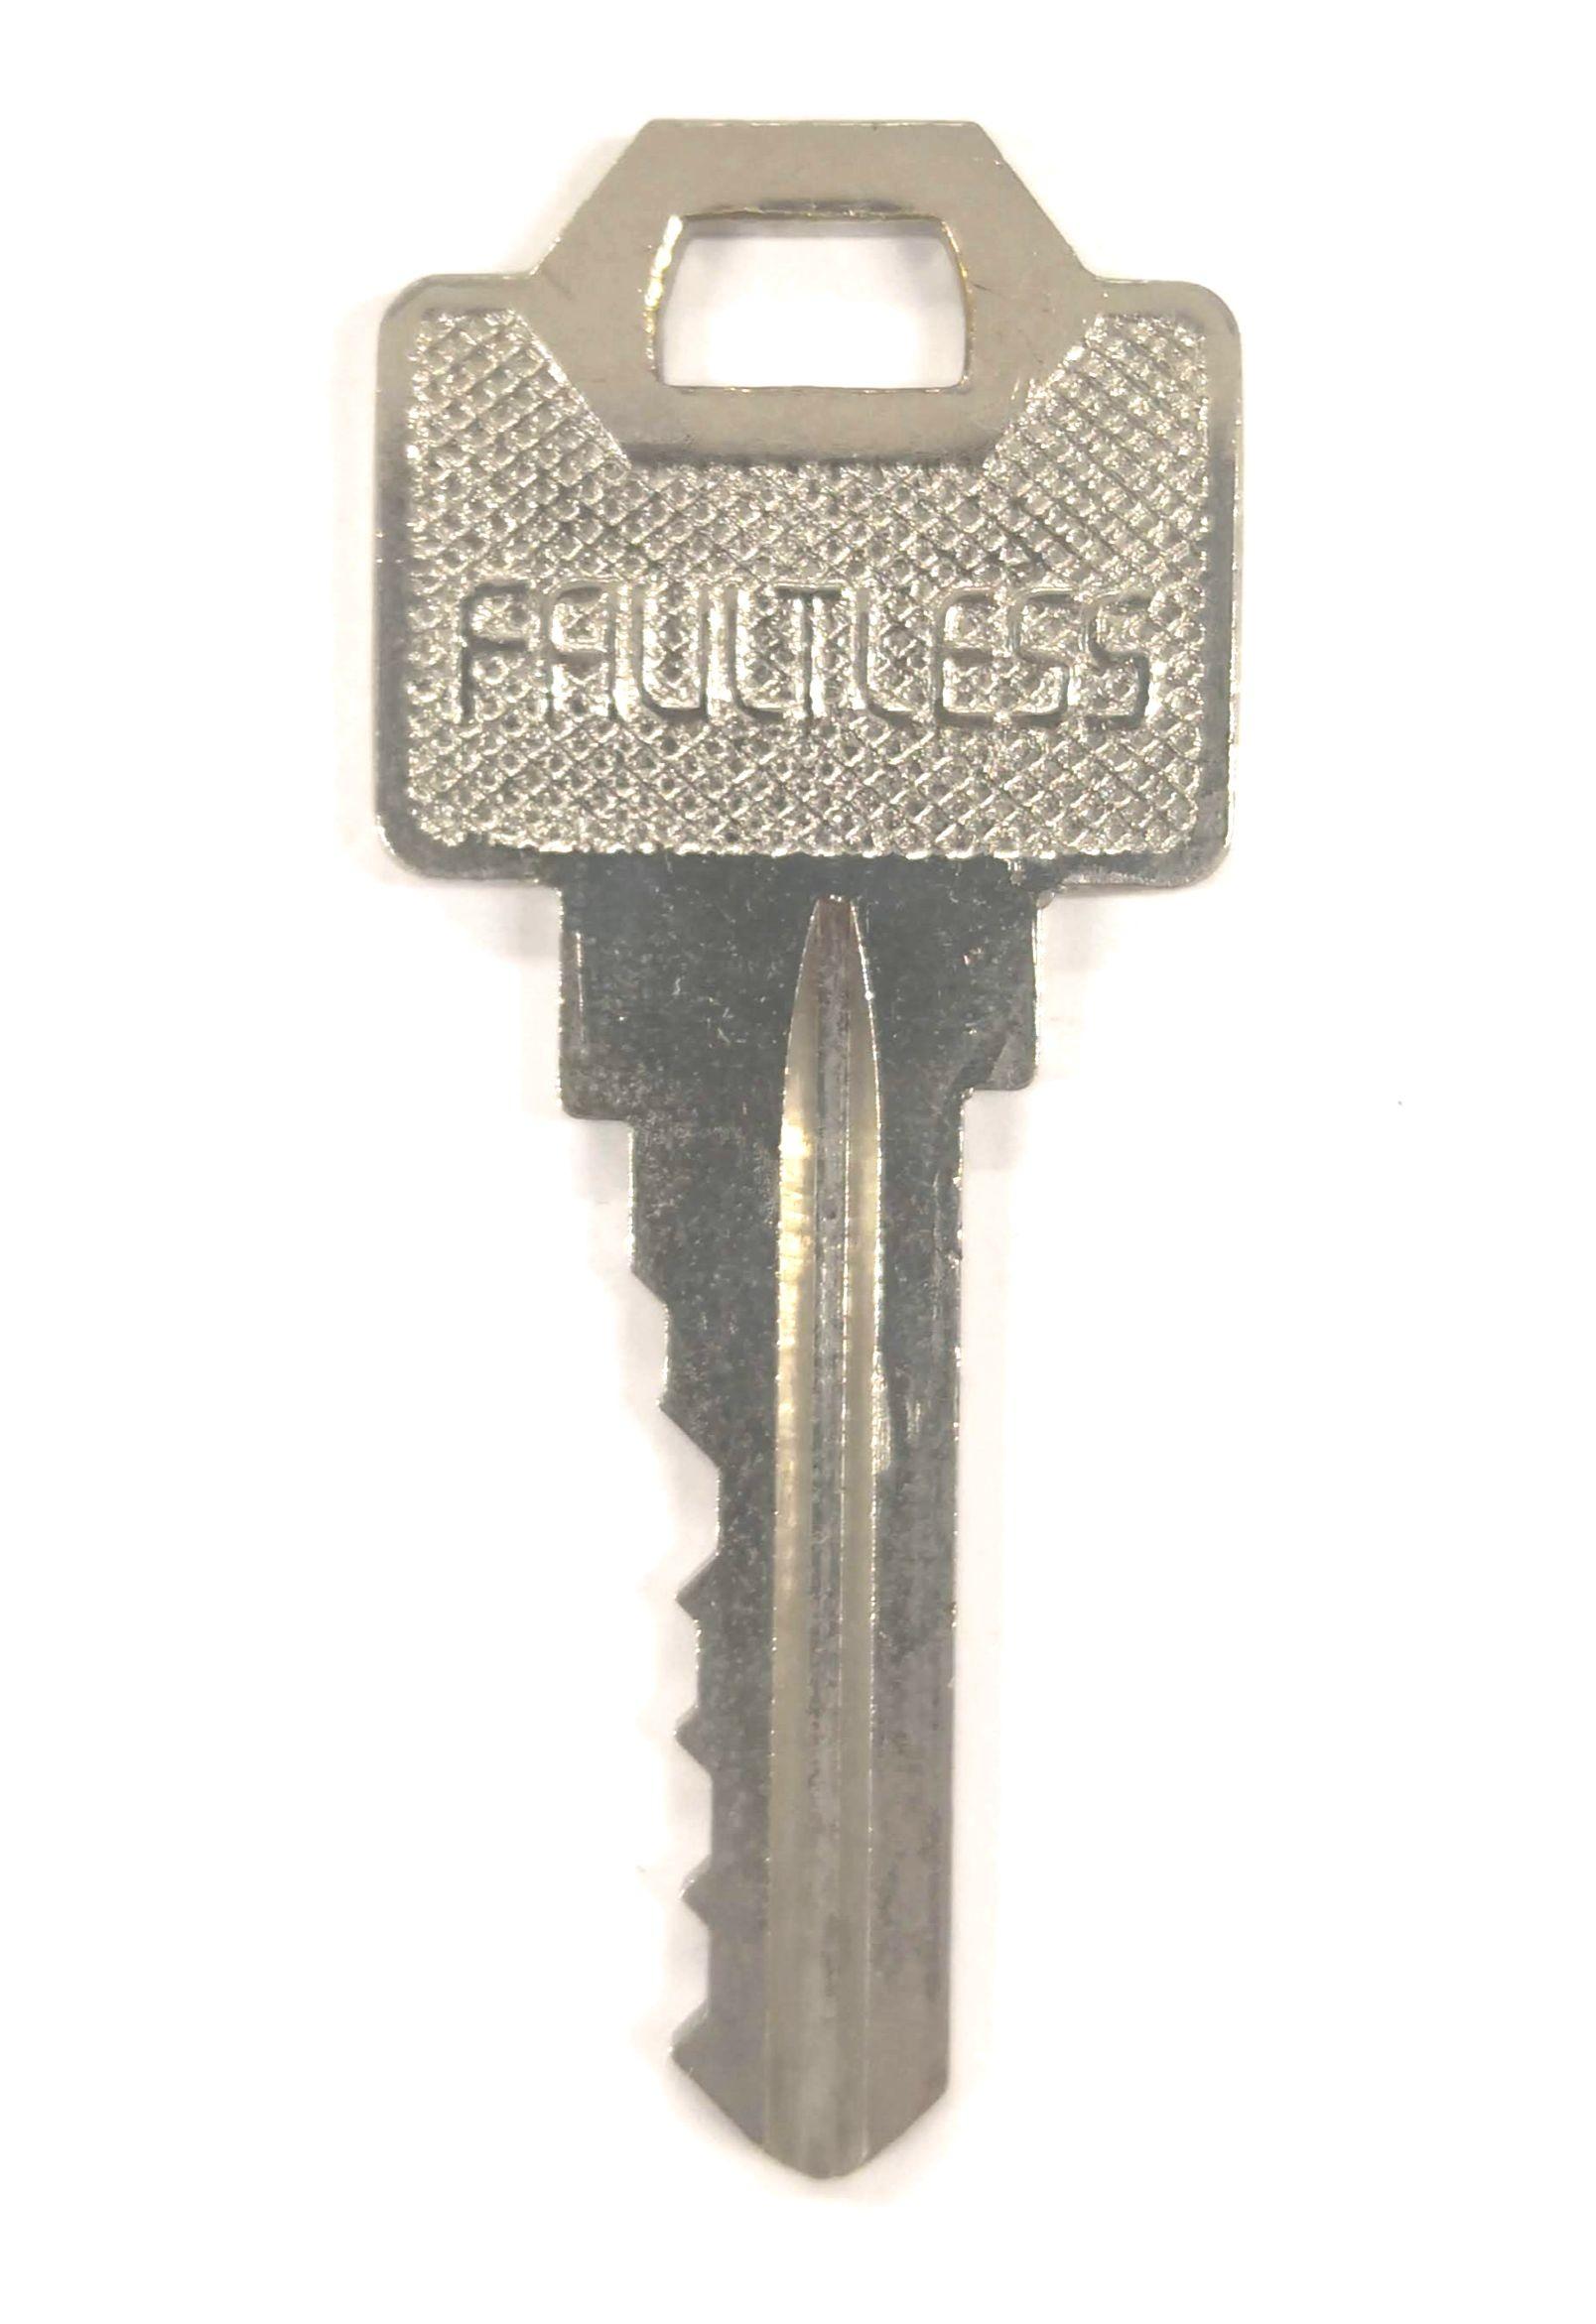 FAULTLESS(フォートレス)ギザギザ鍵